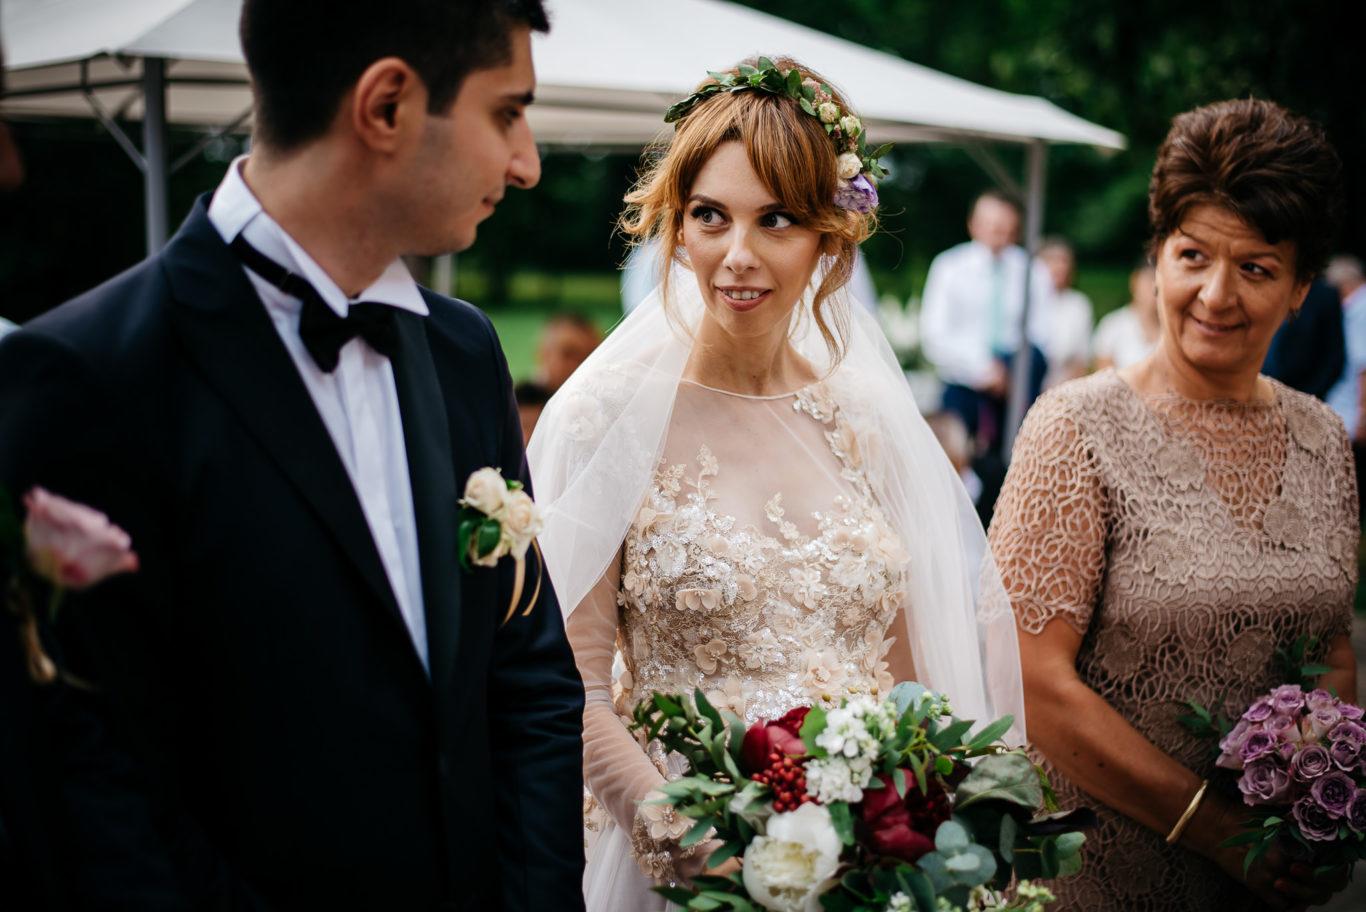 0328-Fotografie-nunta-Stirbey-Laura-Rares-fotograf-Ciprian-Dumitrescu-DSC_6828